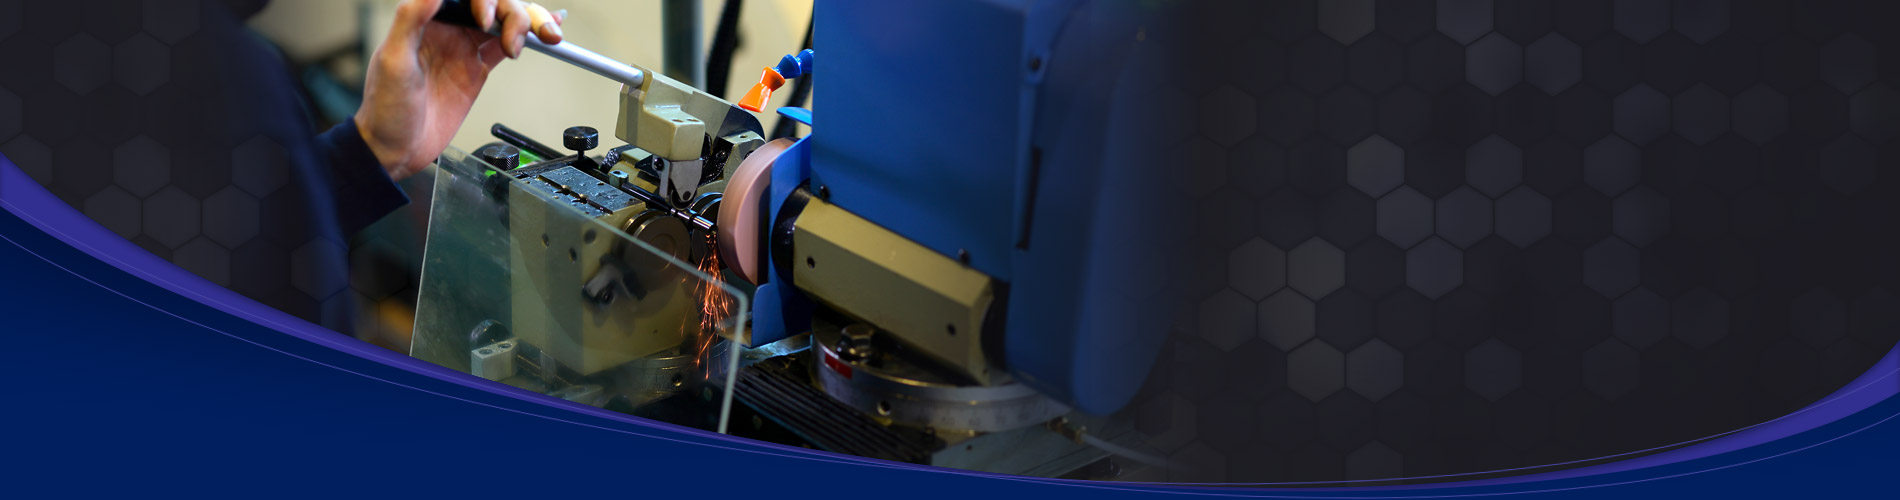 Standardized manufacture process